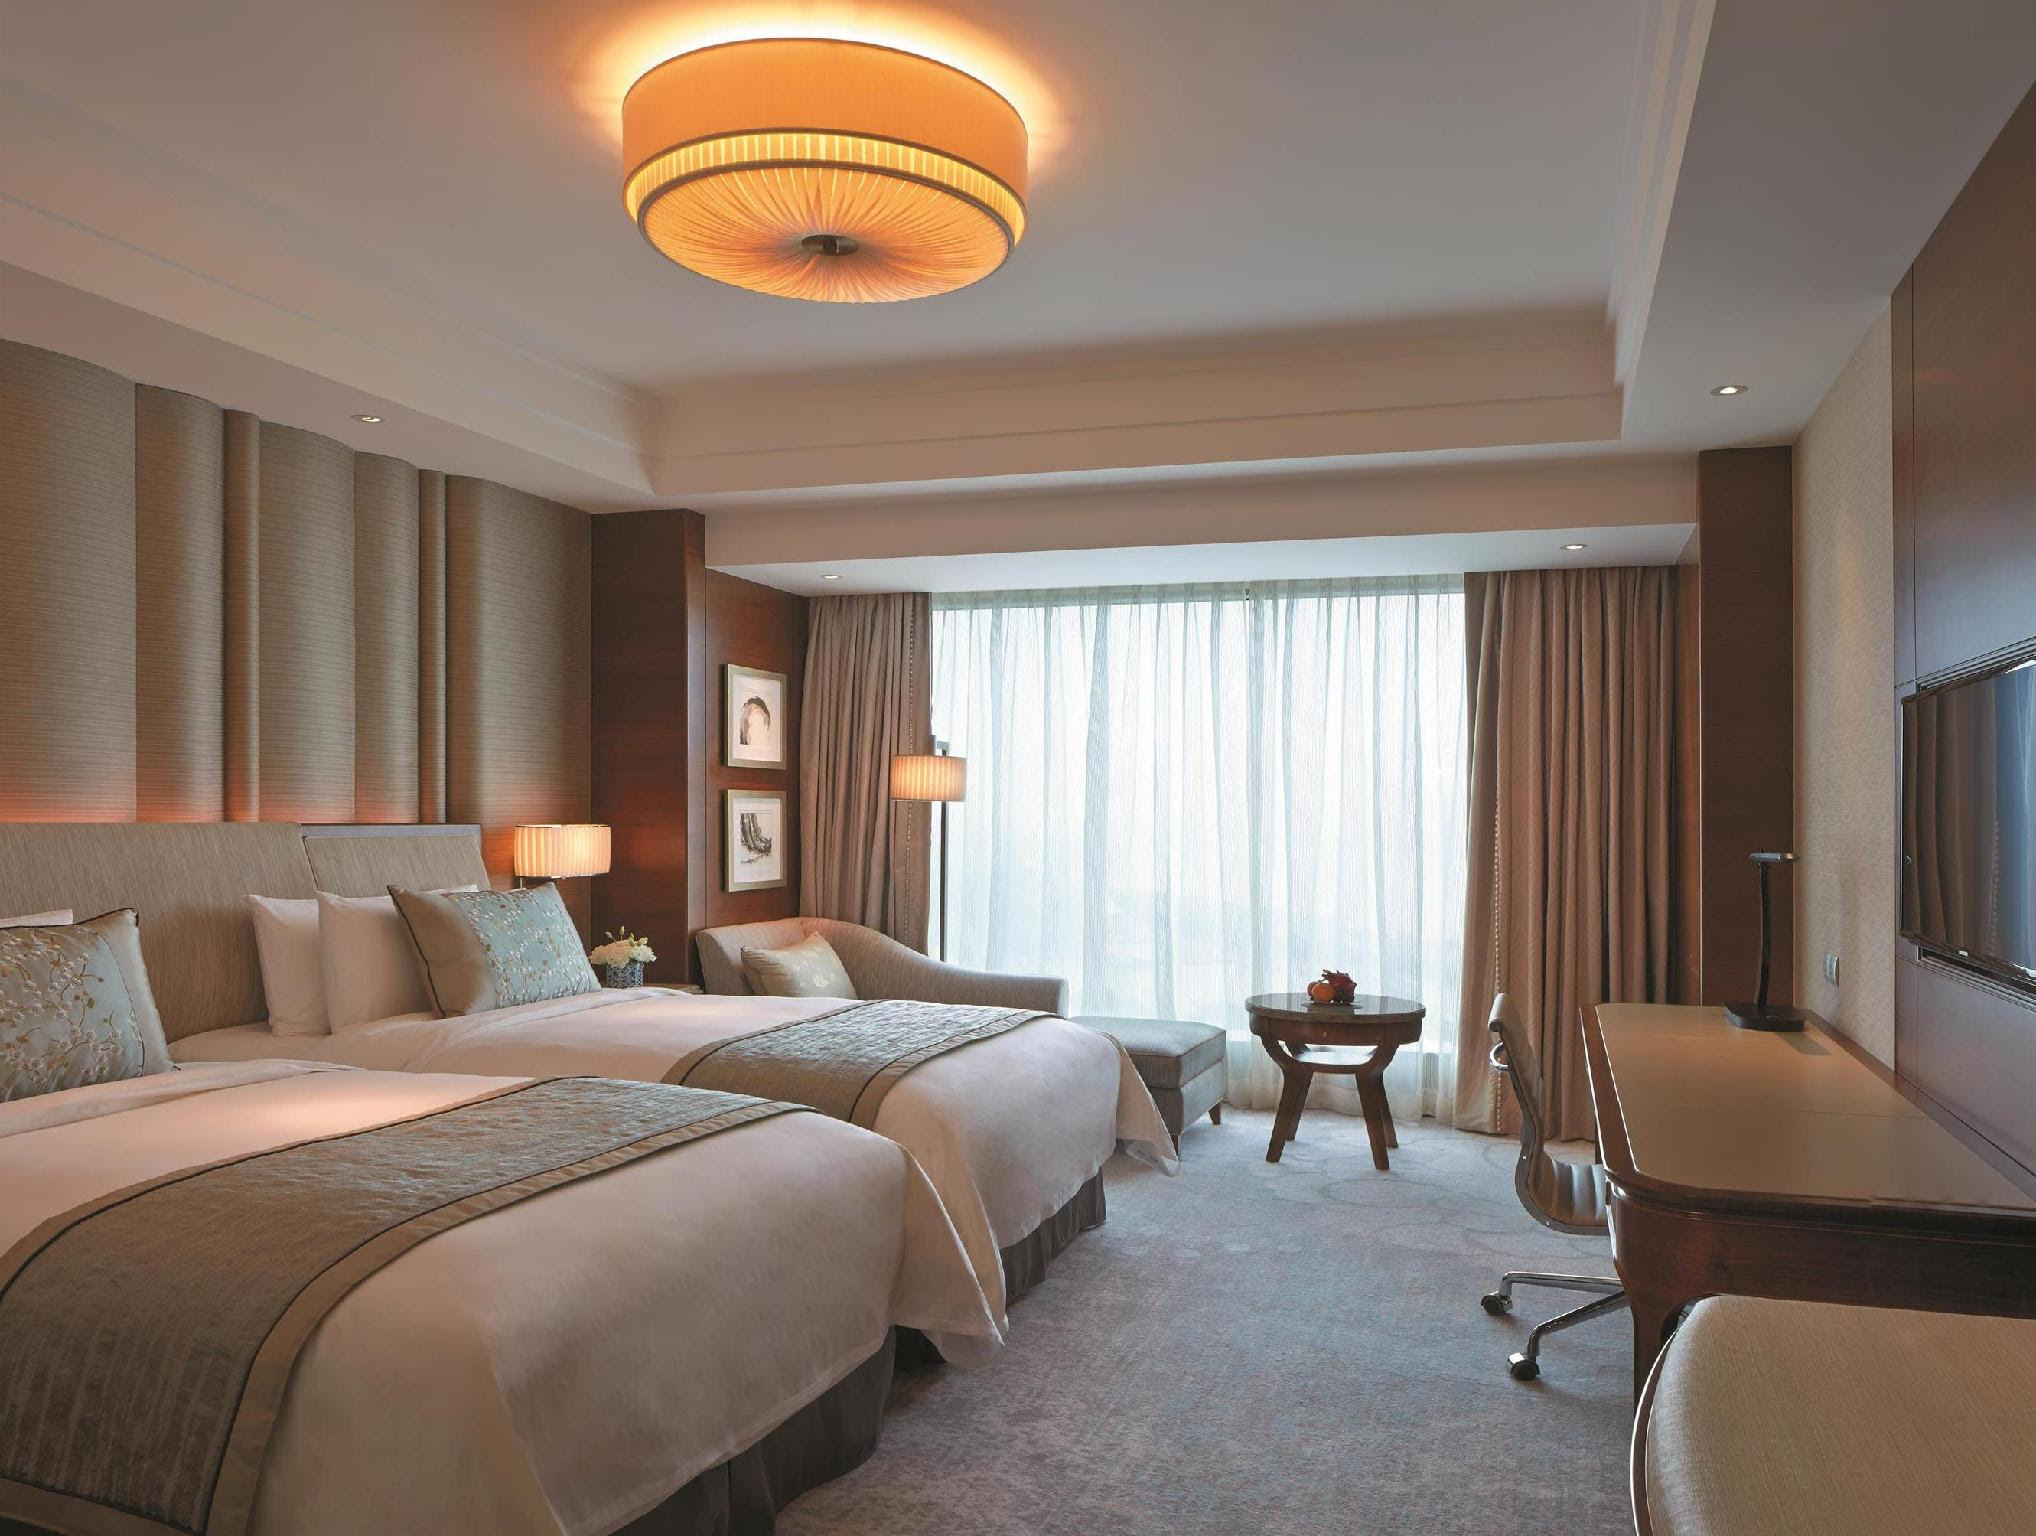 Price Shangri-La Hotel Nanchang